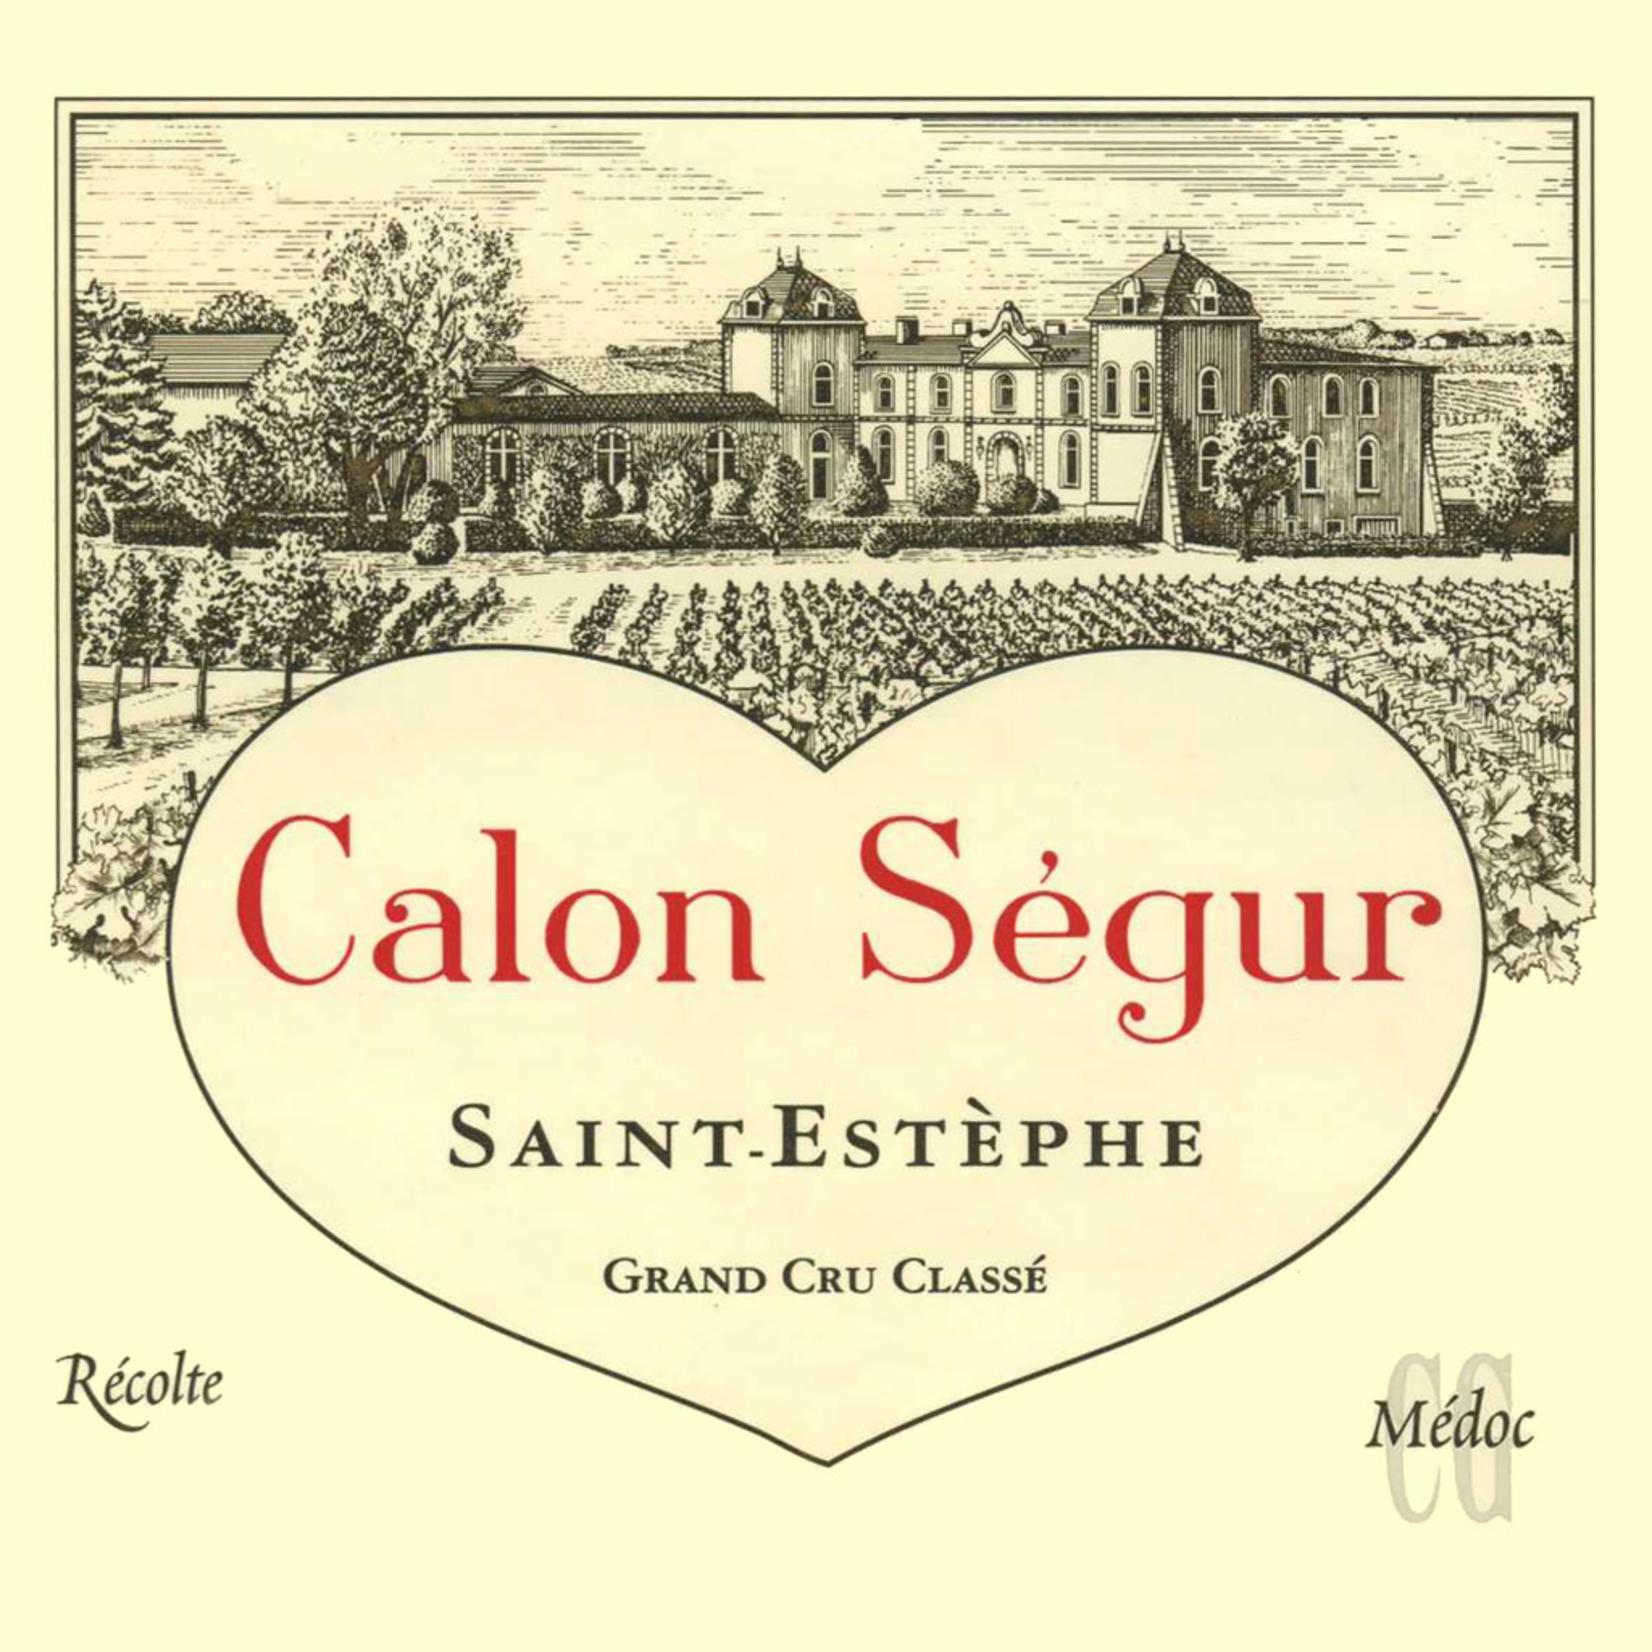 Wine Chateau Calon Segur 2006 3L